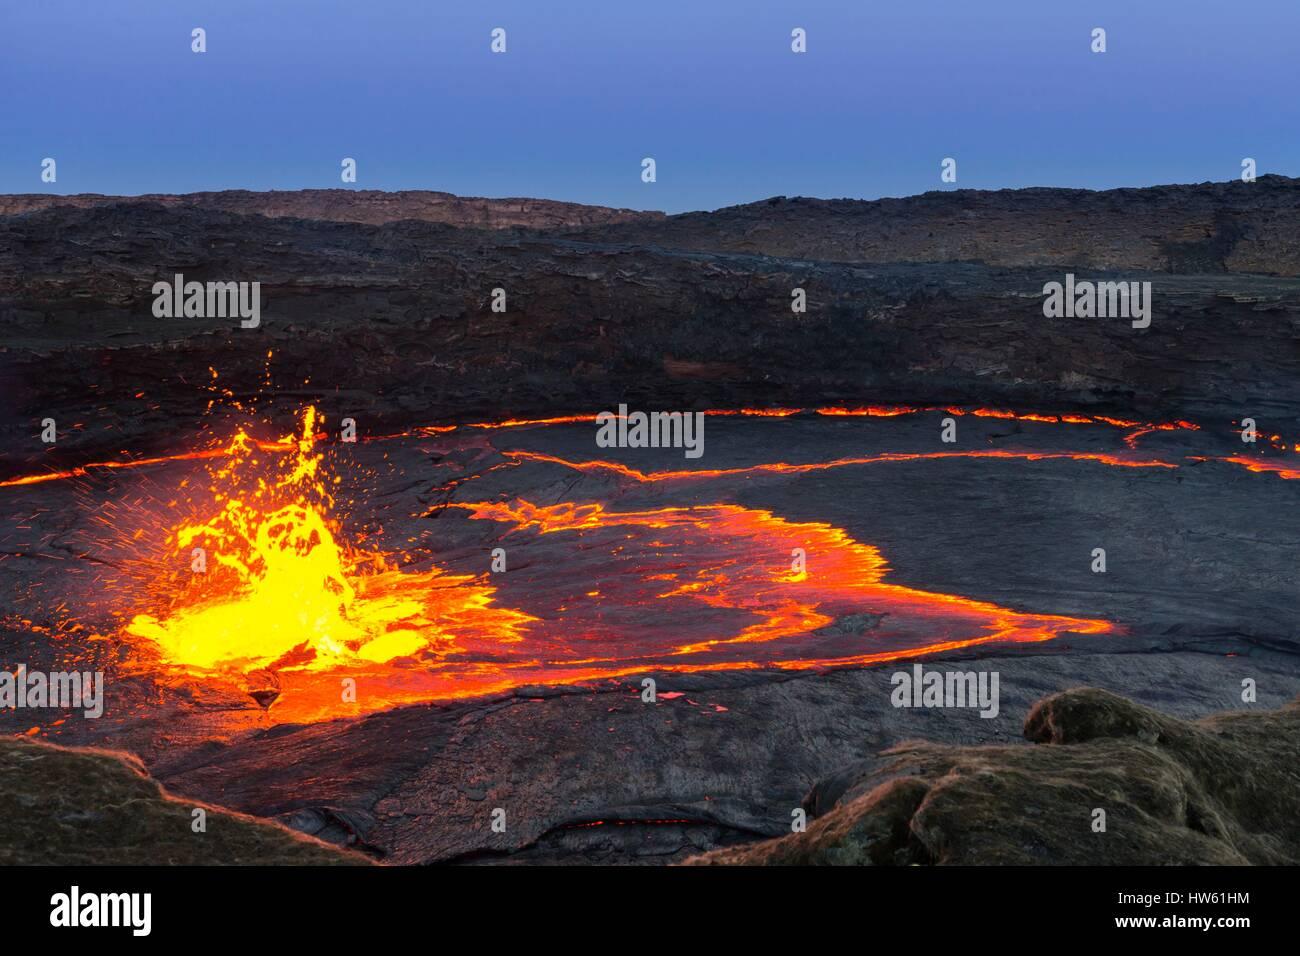 Ethiopia, Afar Region, Great Rift Valley, Erta Ale Volcano